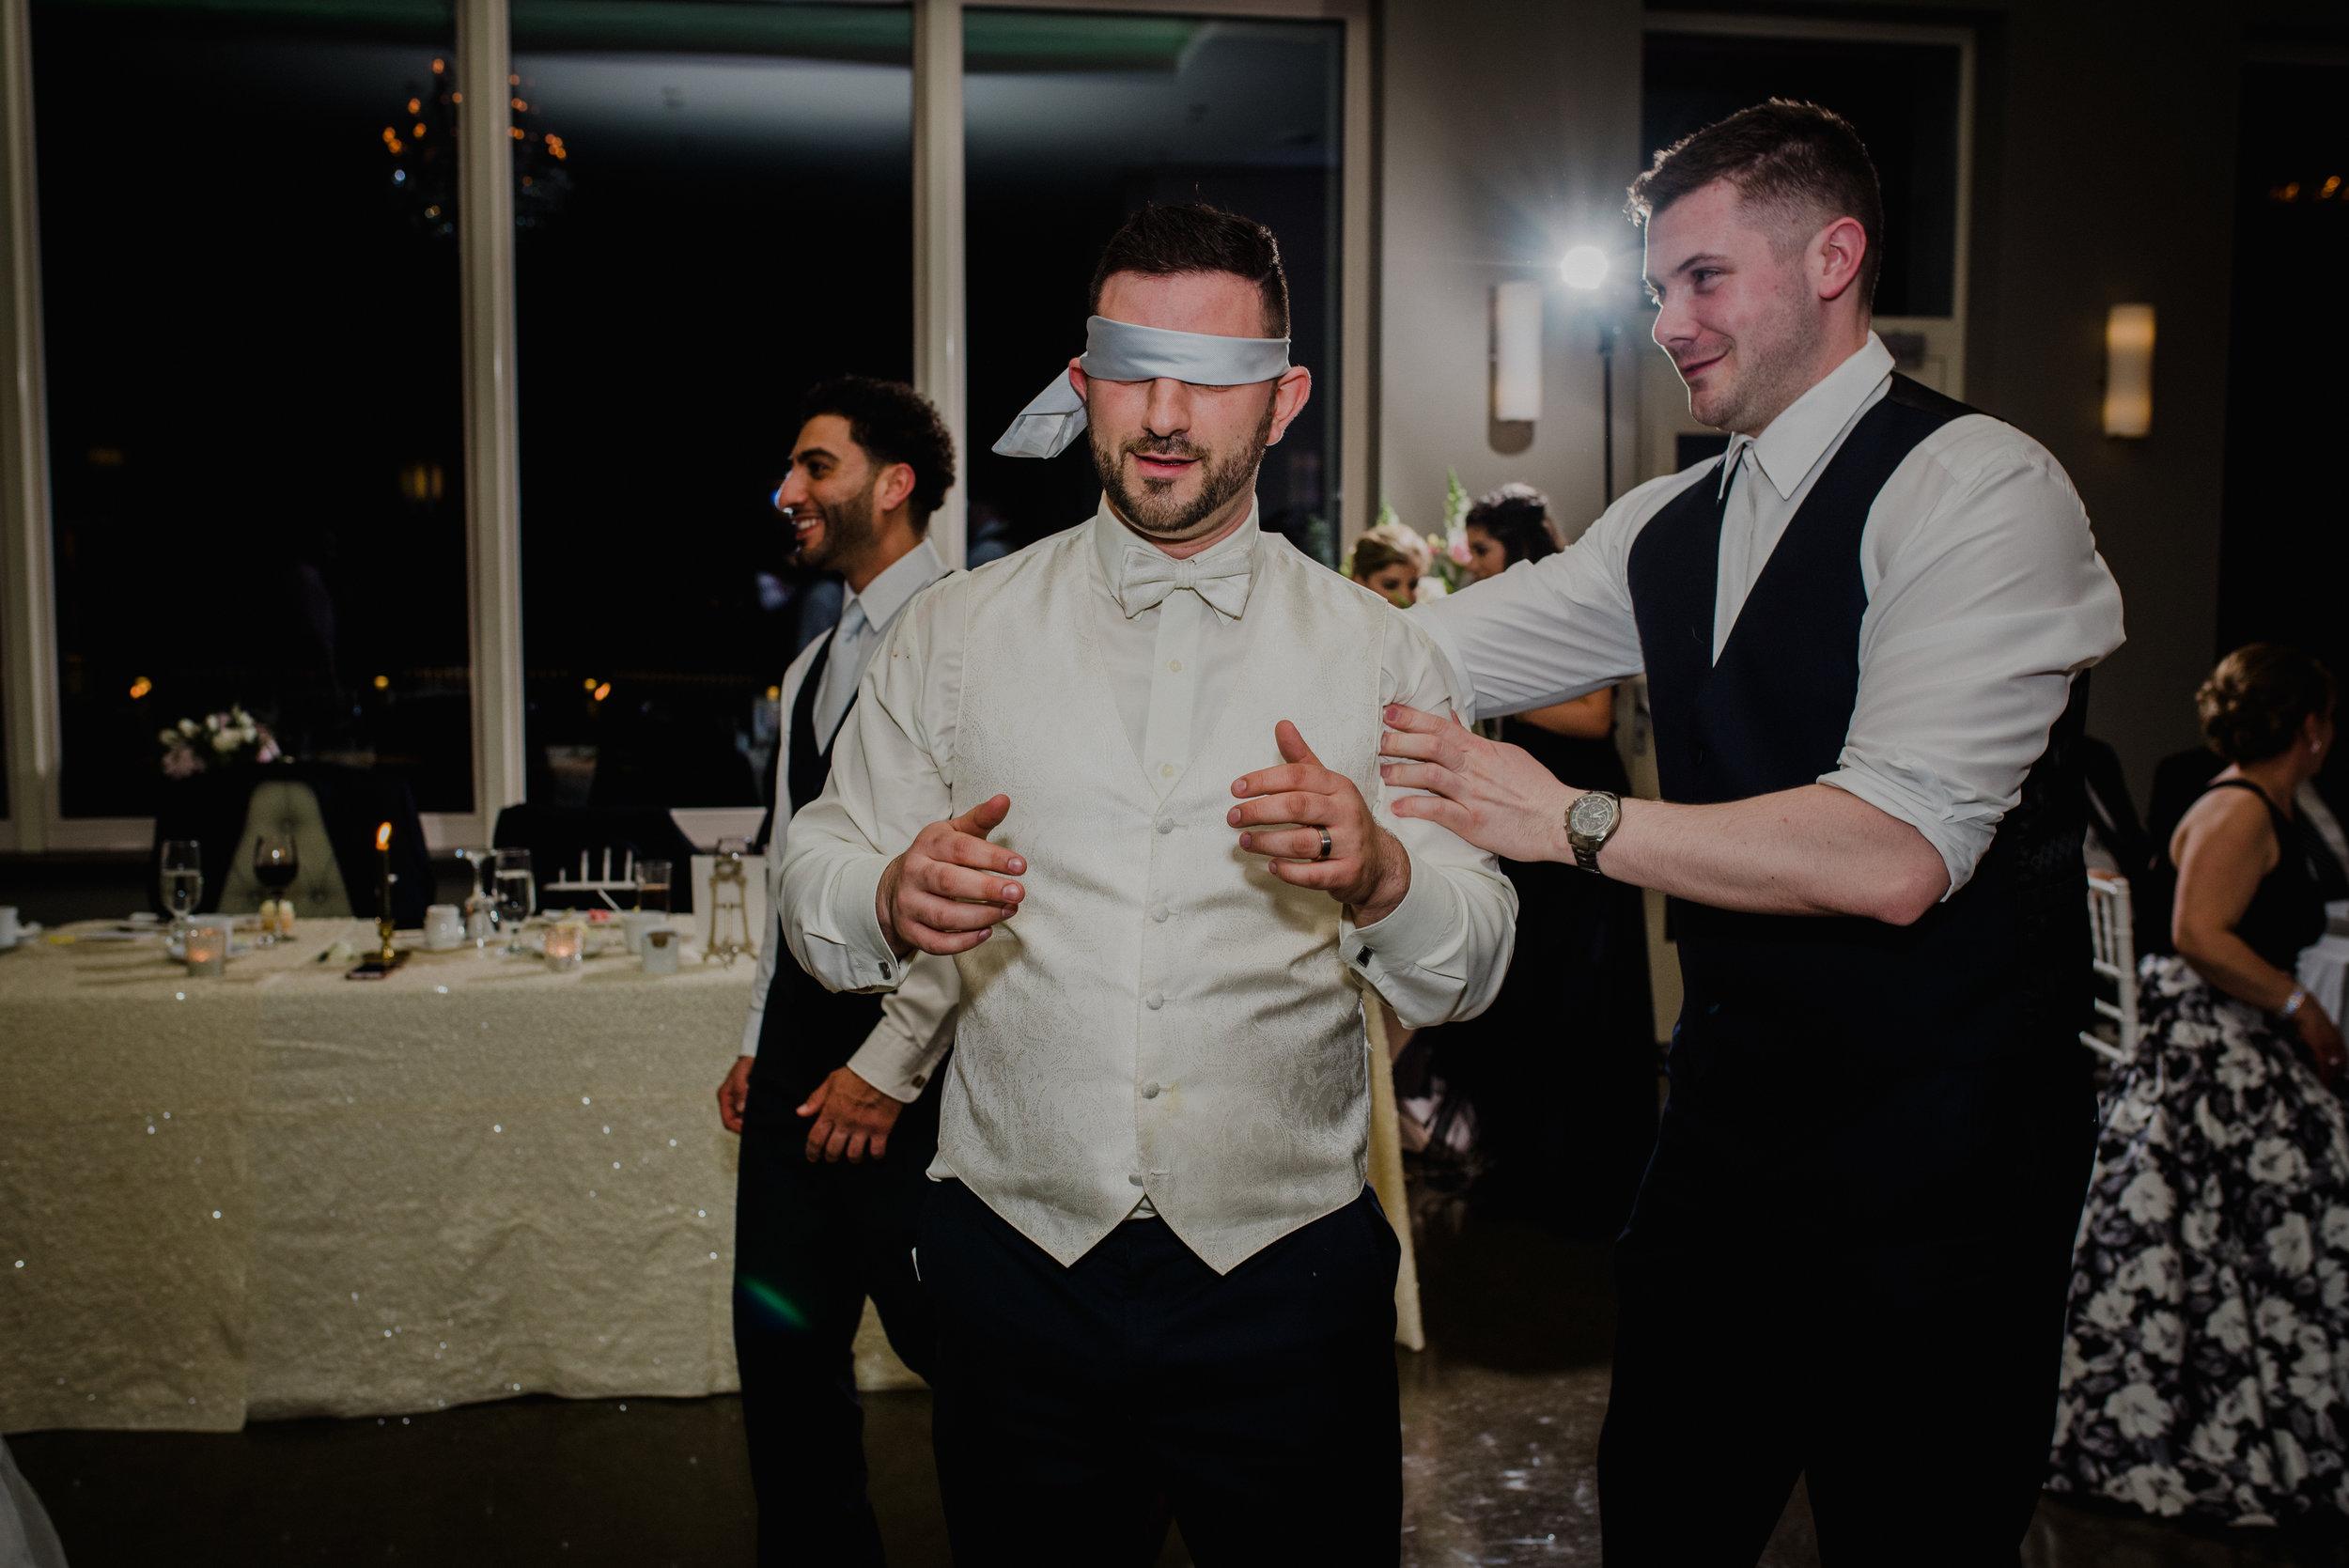 e Belvedere, Wakefield Wedding - Dinner Party 12